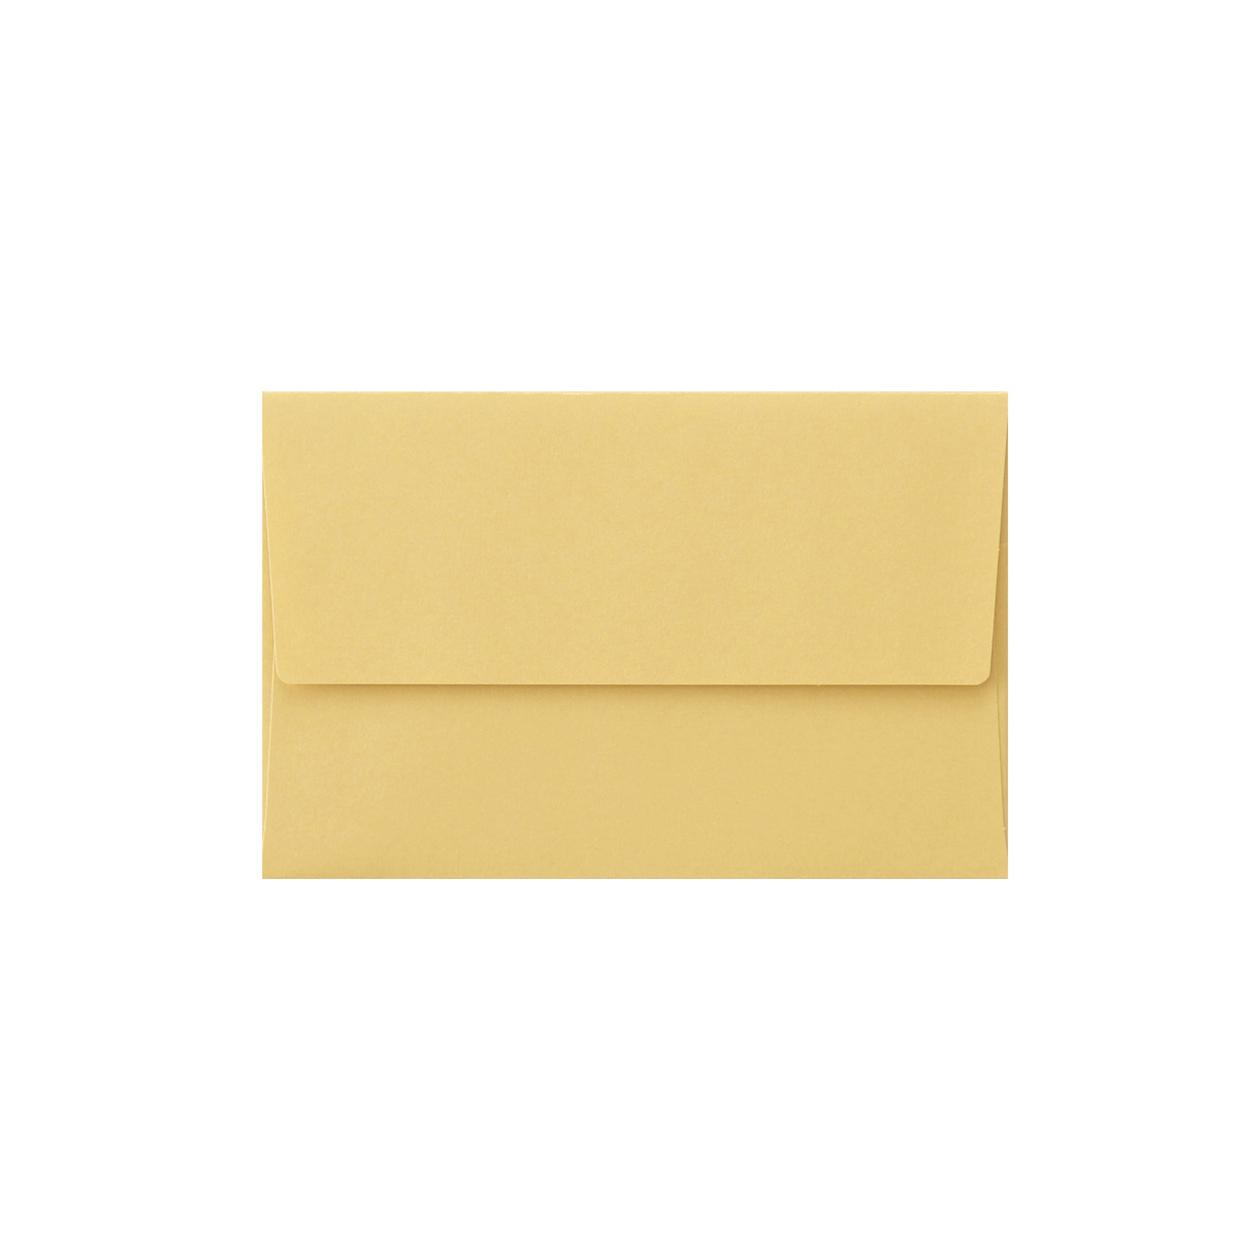 NEカマス封筒 上質カラー ゴールド 97.4g